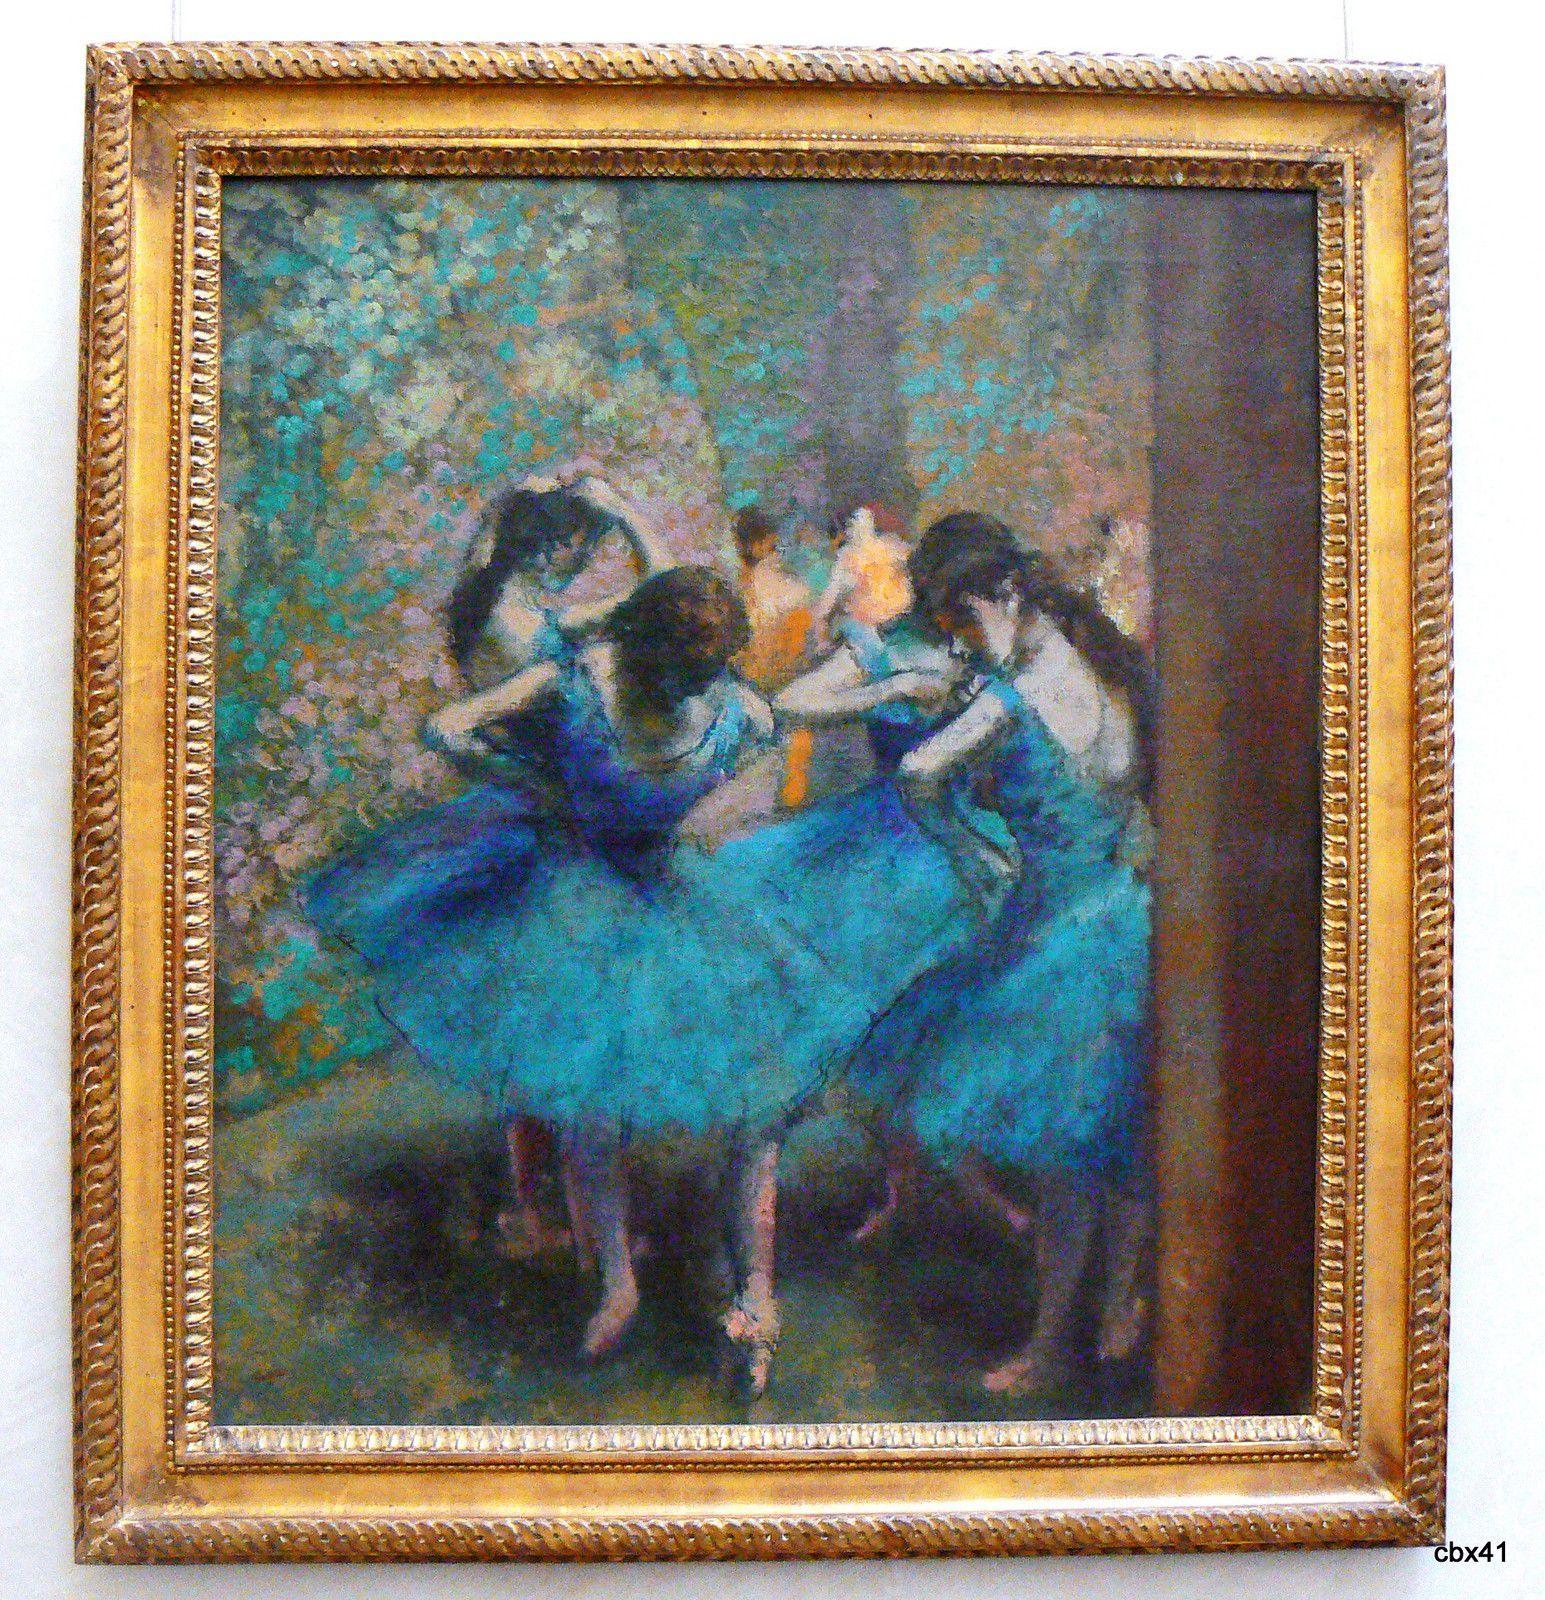 Edgar Degas, Danseuses bleues